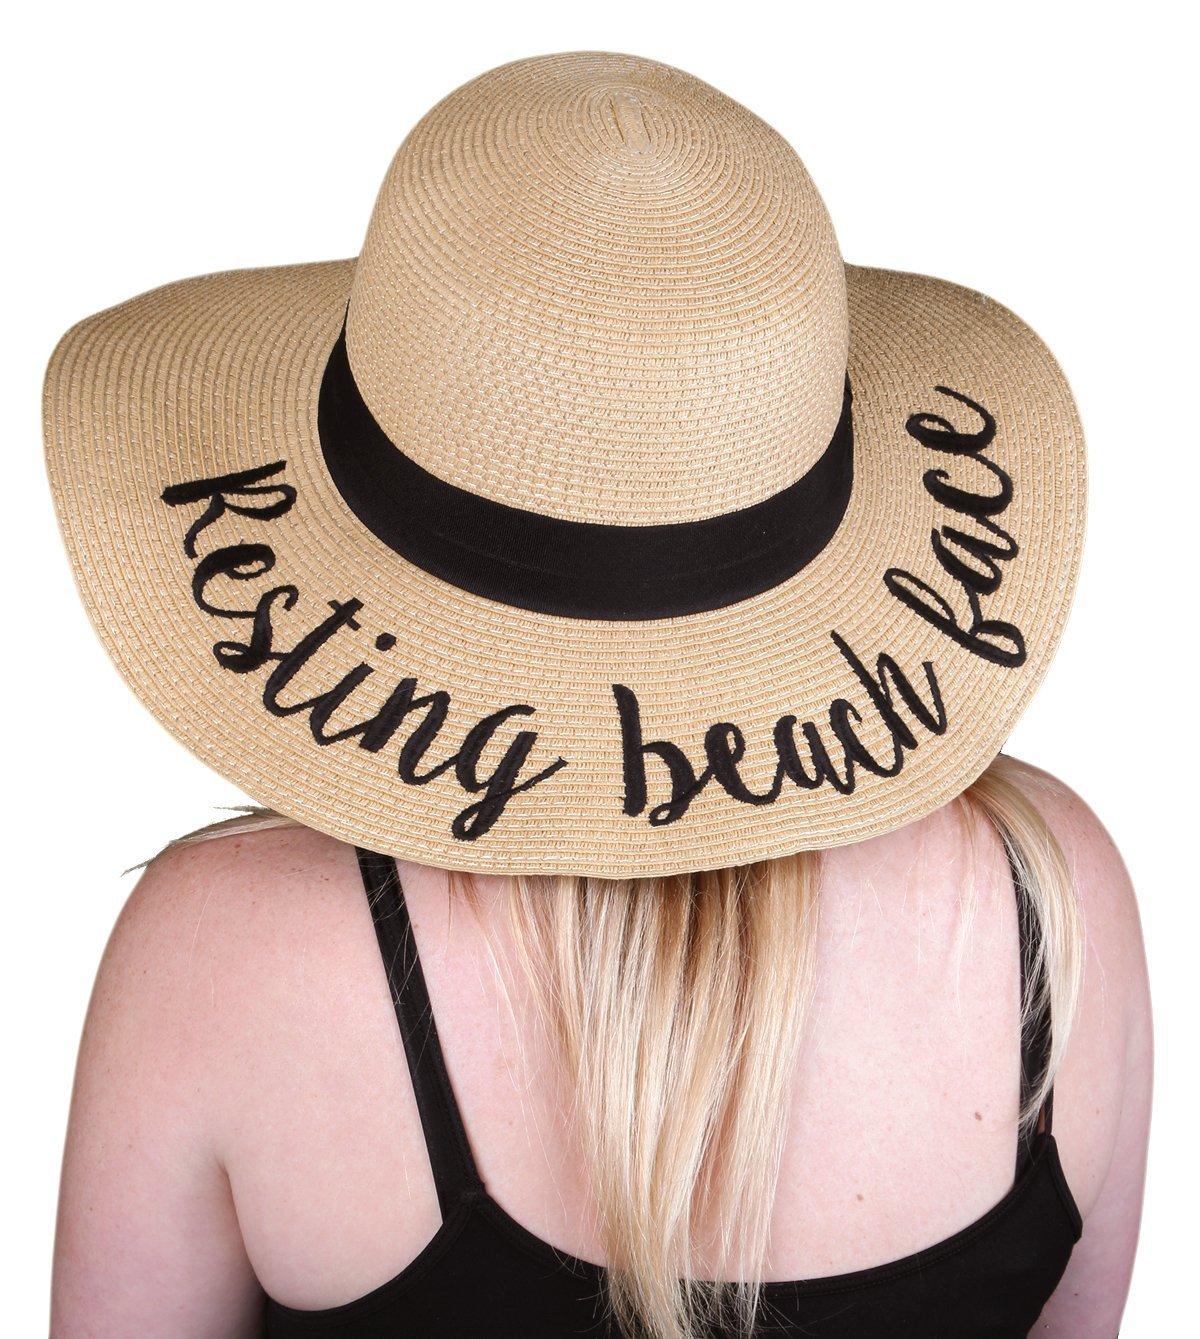 Funky Junque 's Women 's太字筆記体刺繍調節可能なビーチフロッピー太陽帽子 B06XXL7181 Resting Beach Face Resting Beach Face